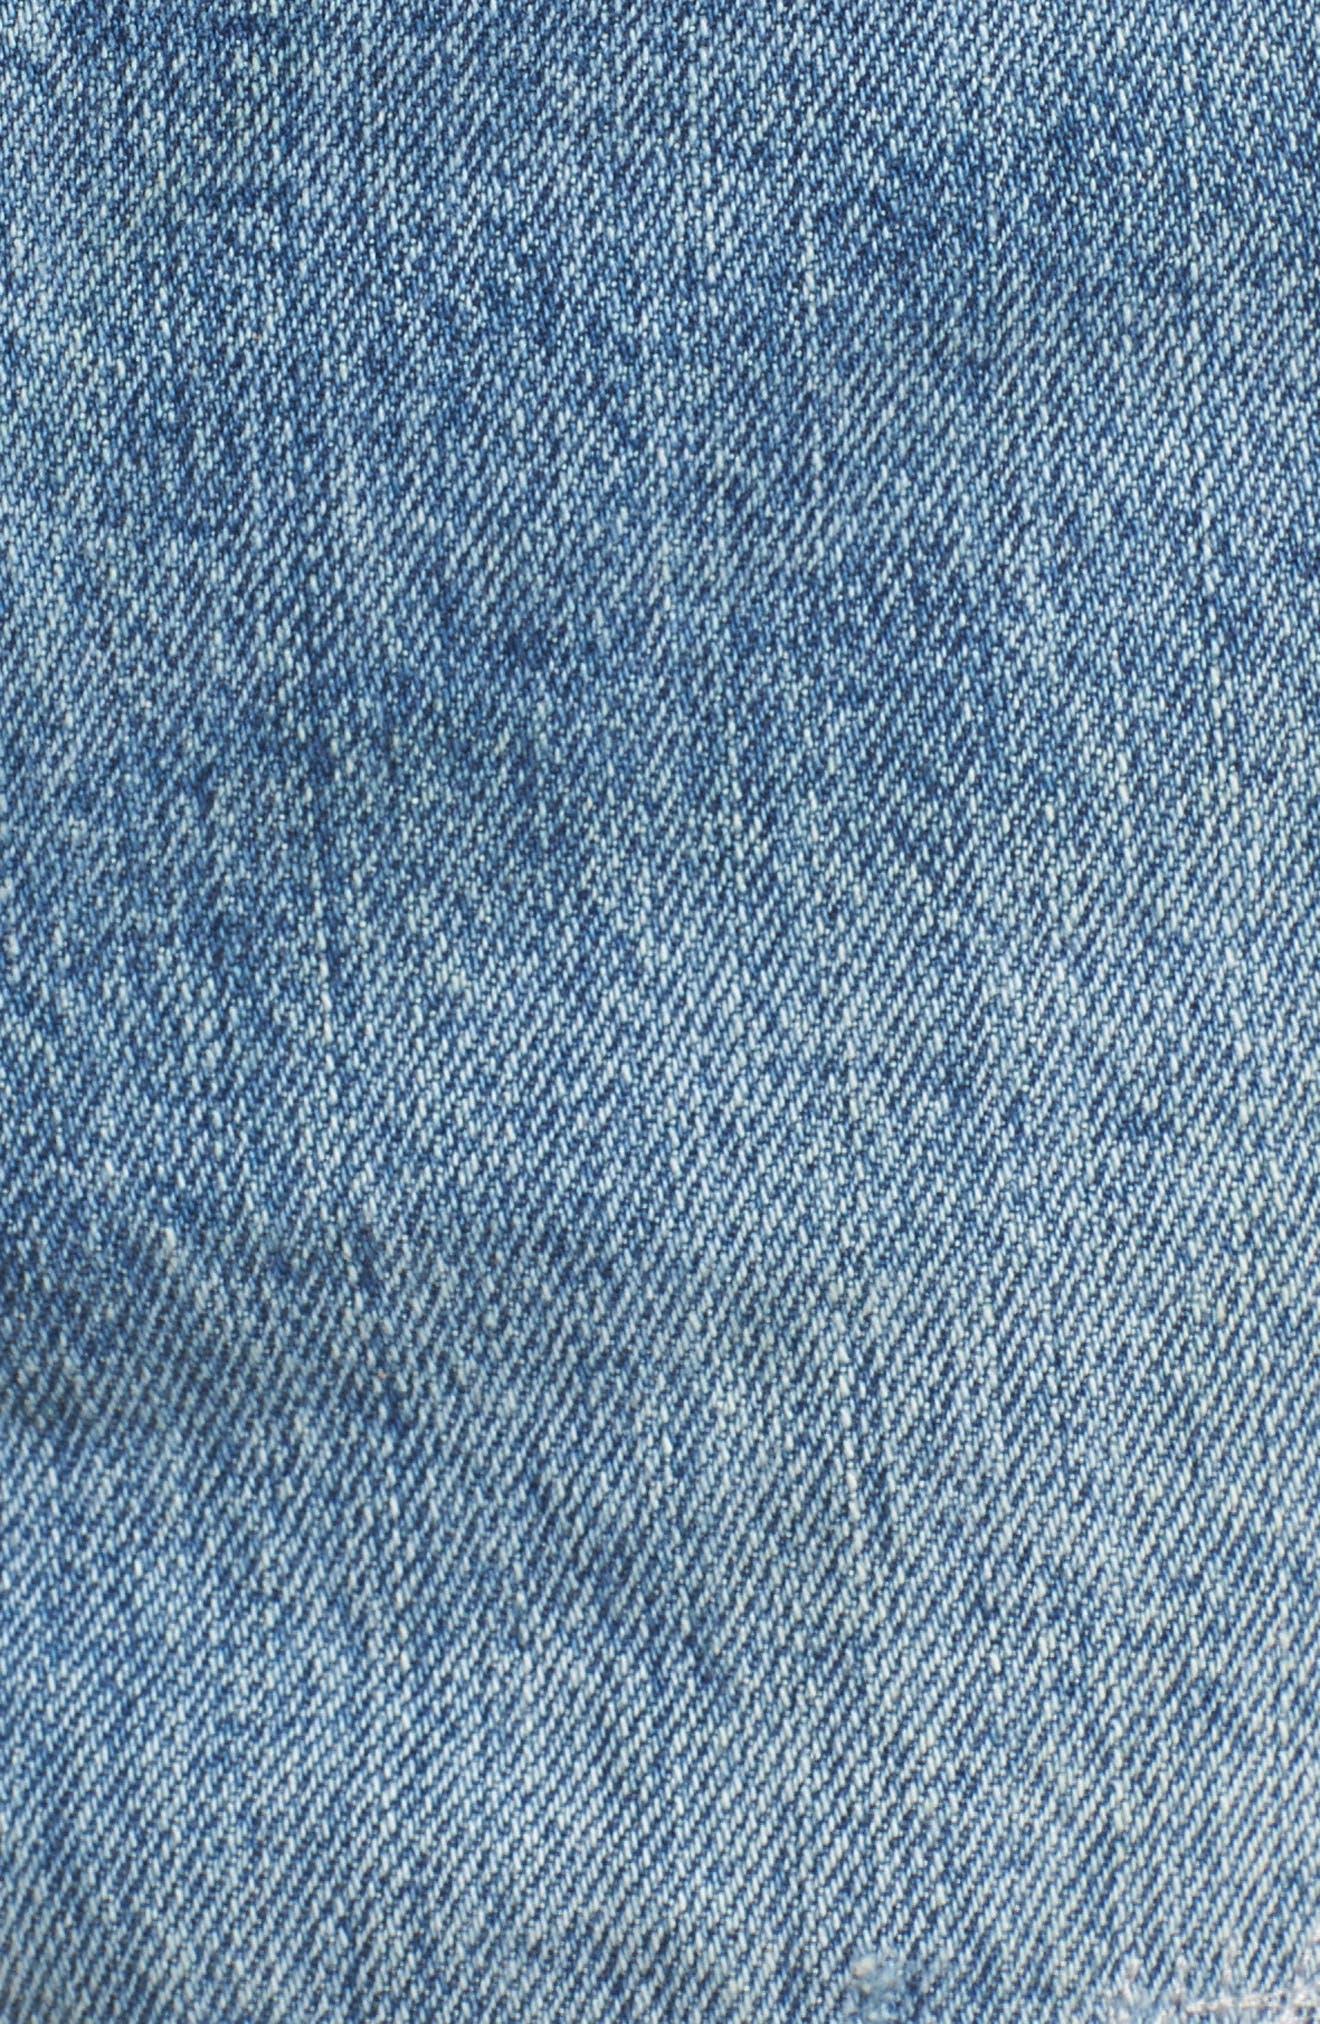 Wedgie High Waist Cutoff Denim Shorts,                             Alternate thumbnail 6, color,                             401